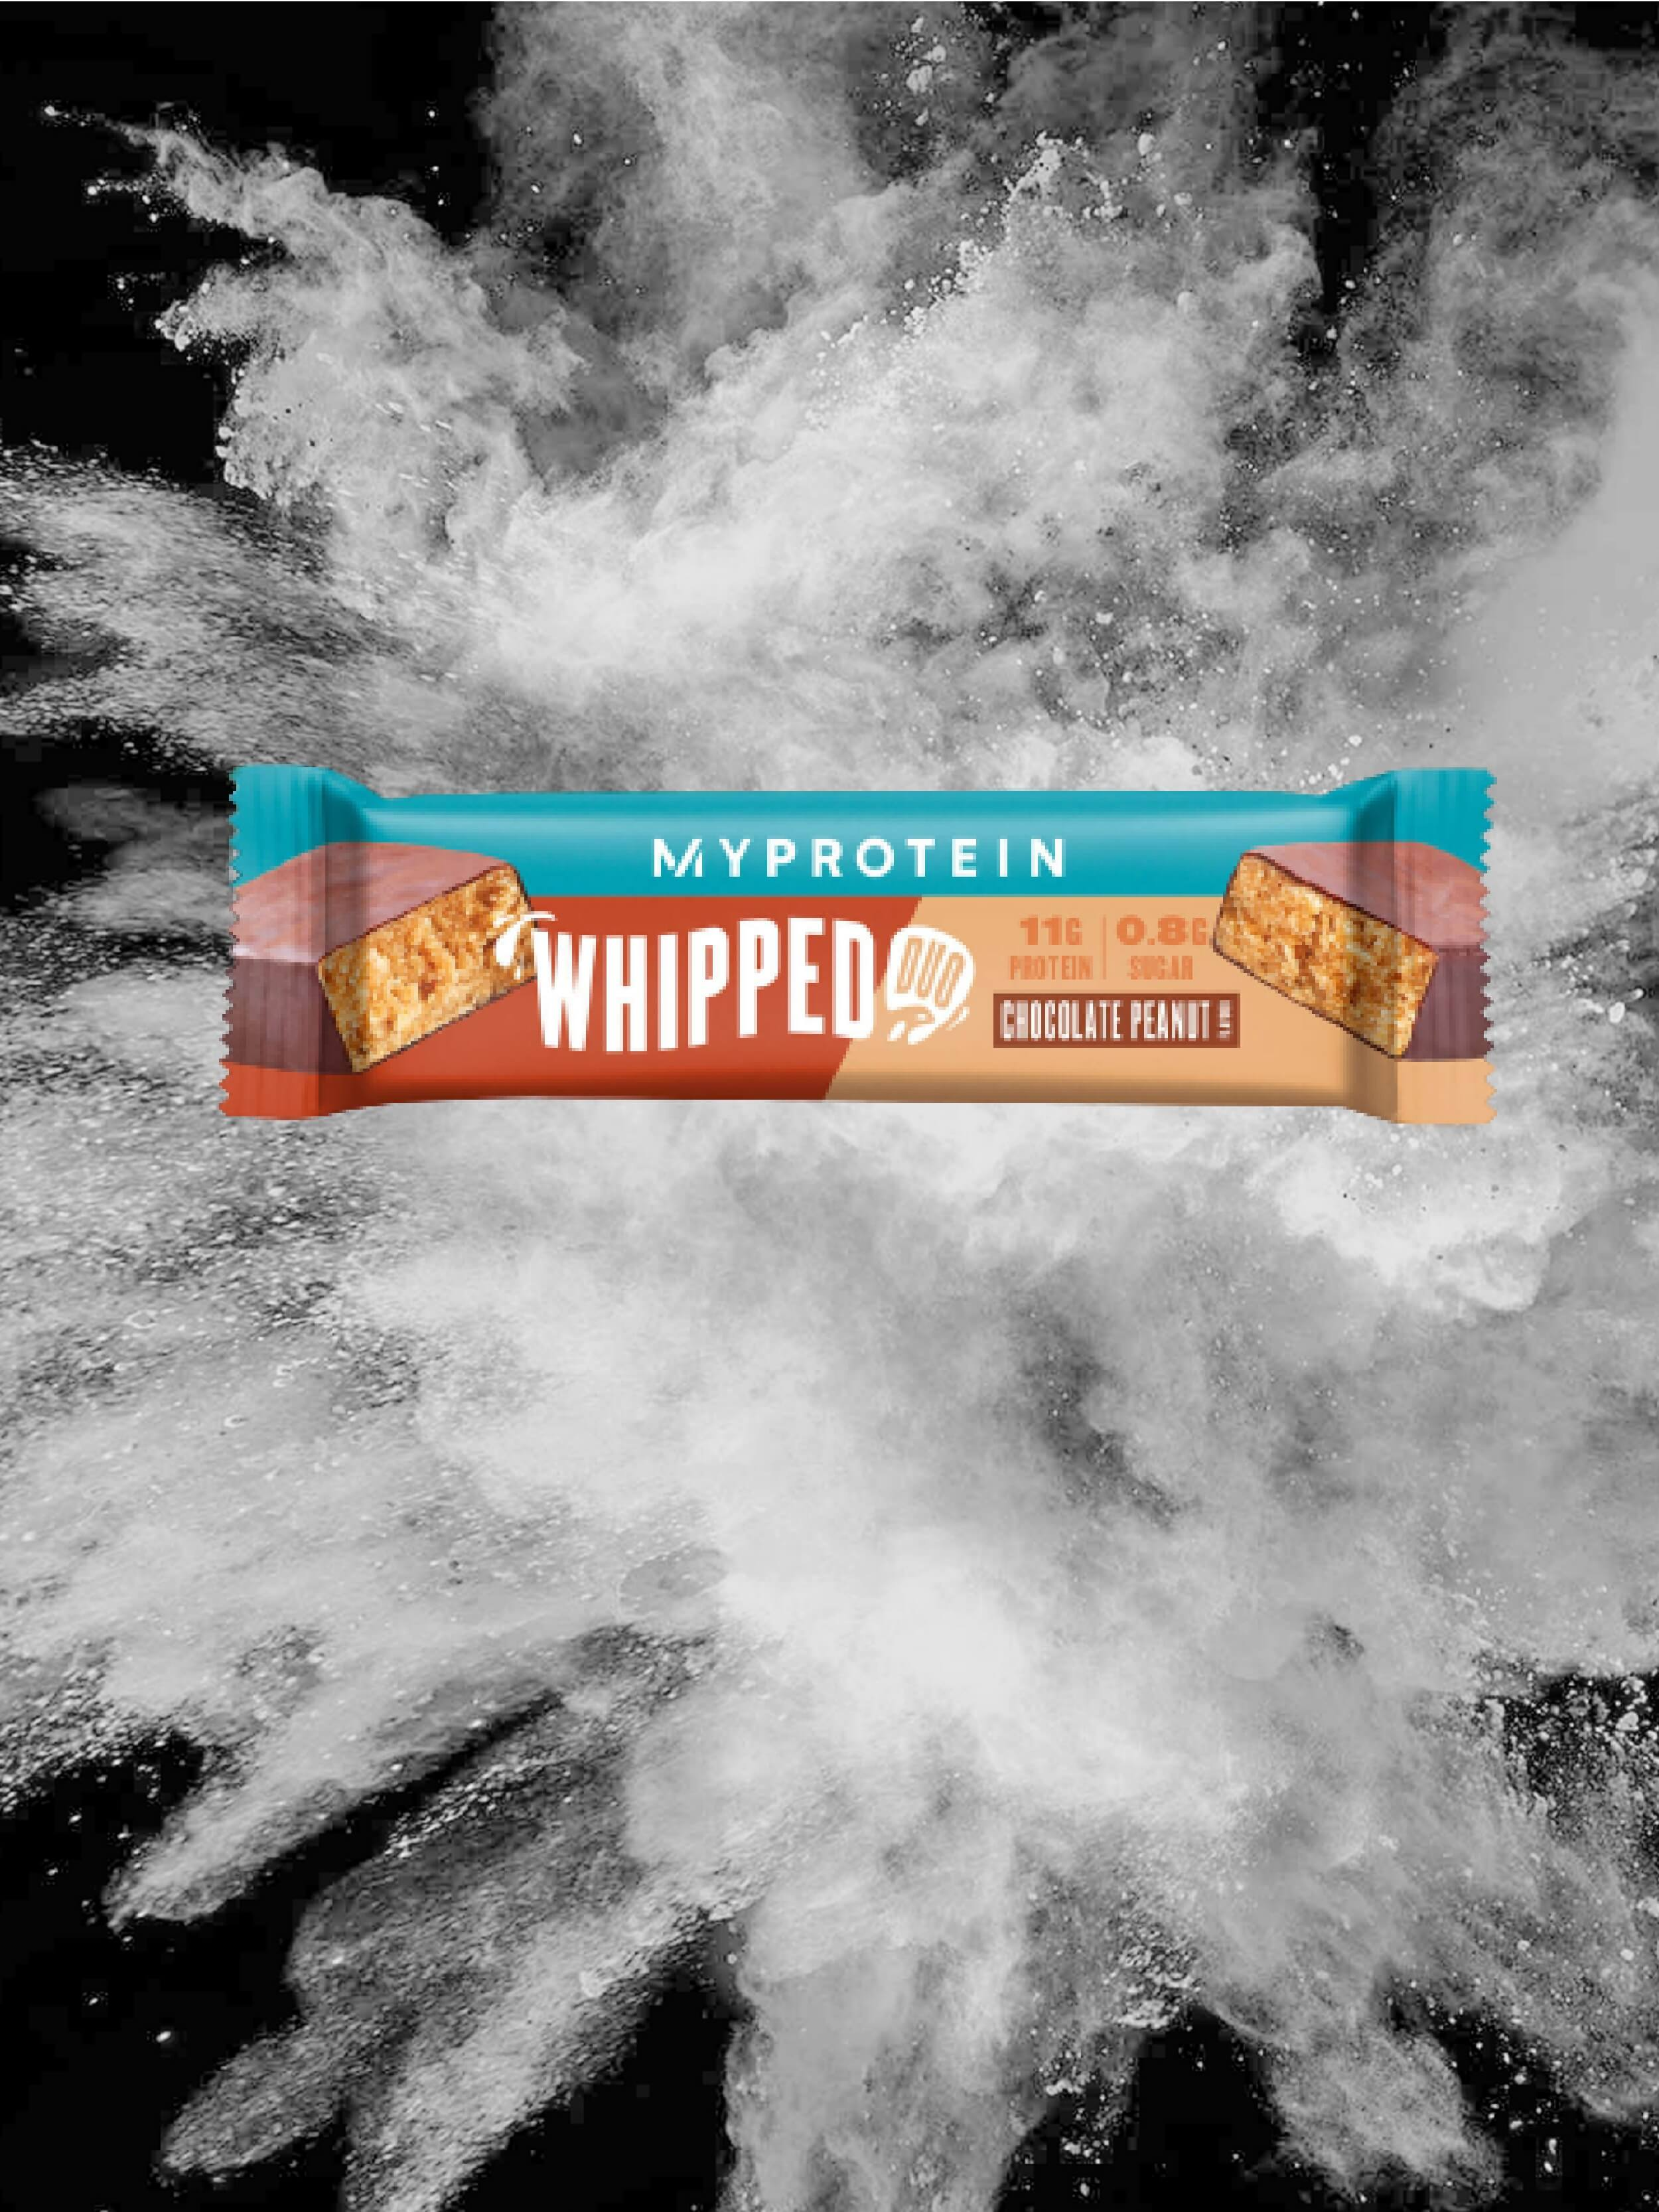 Whipped Duo's Chocolate Peanut